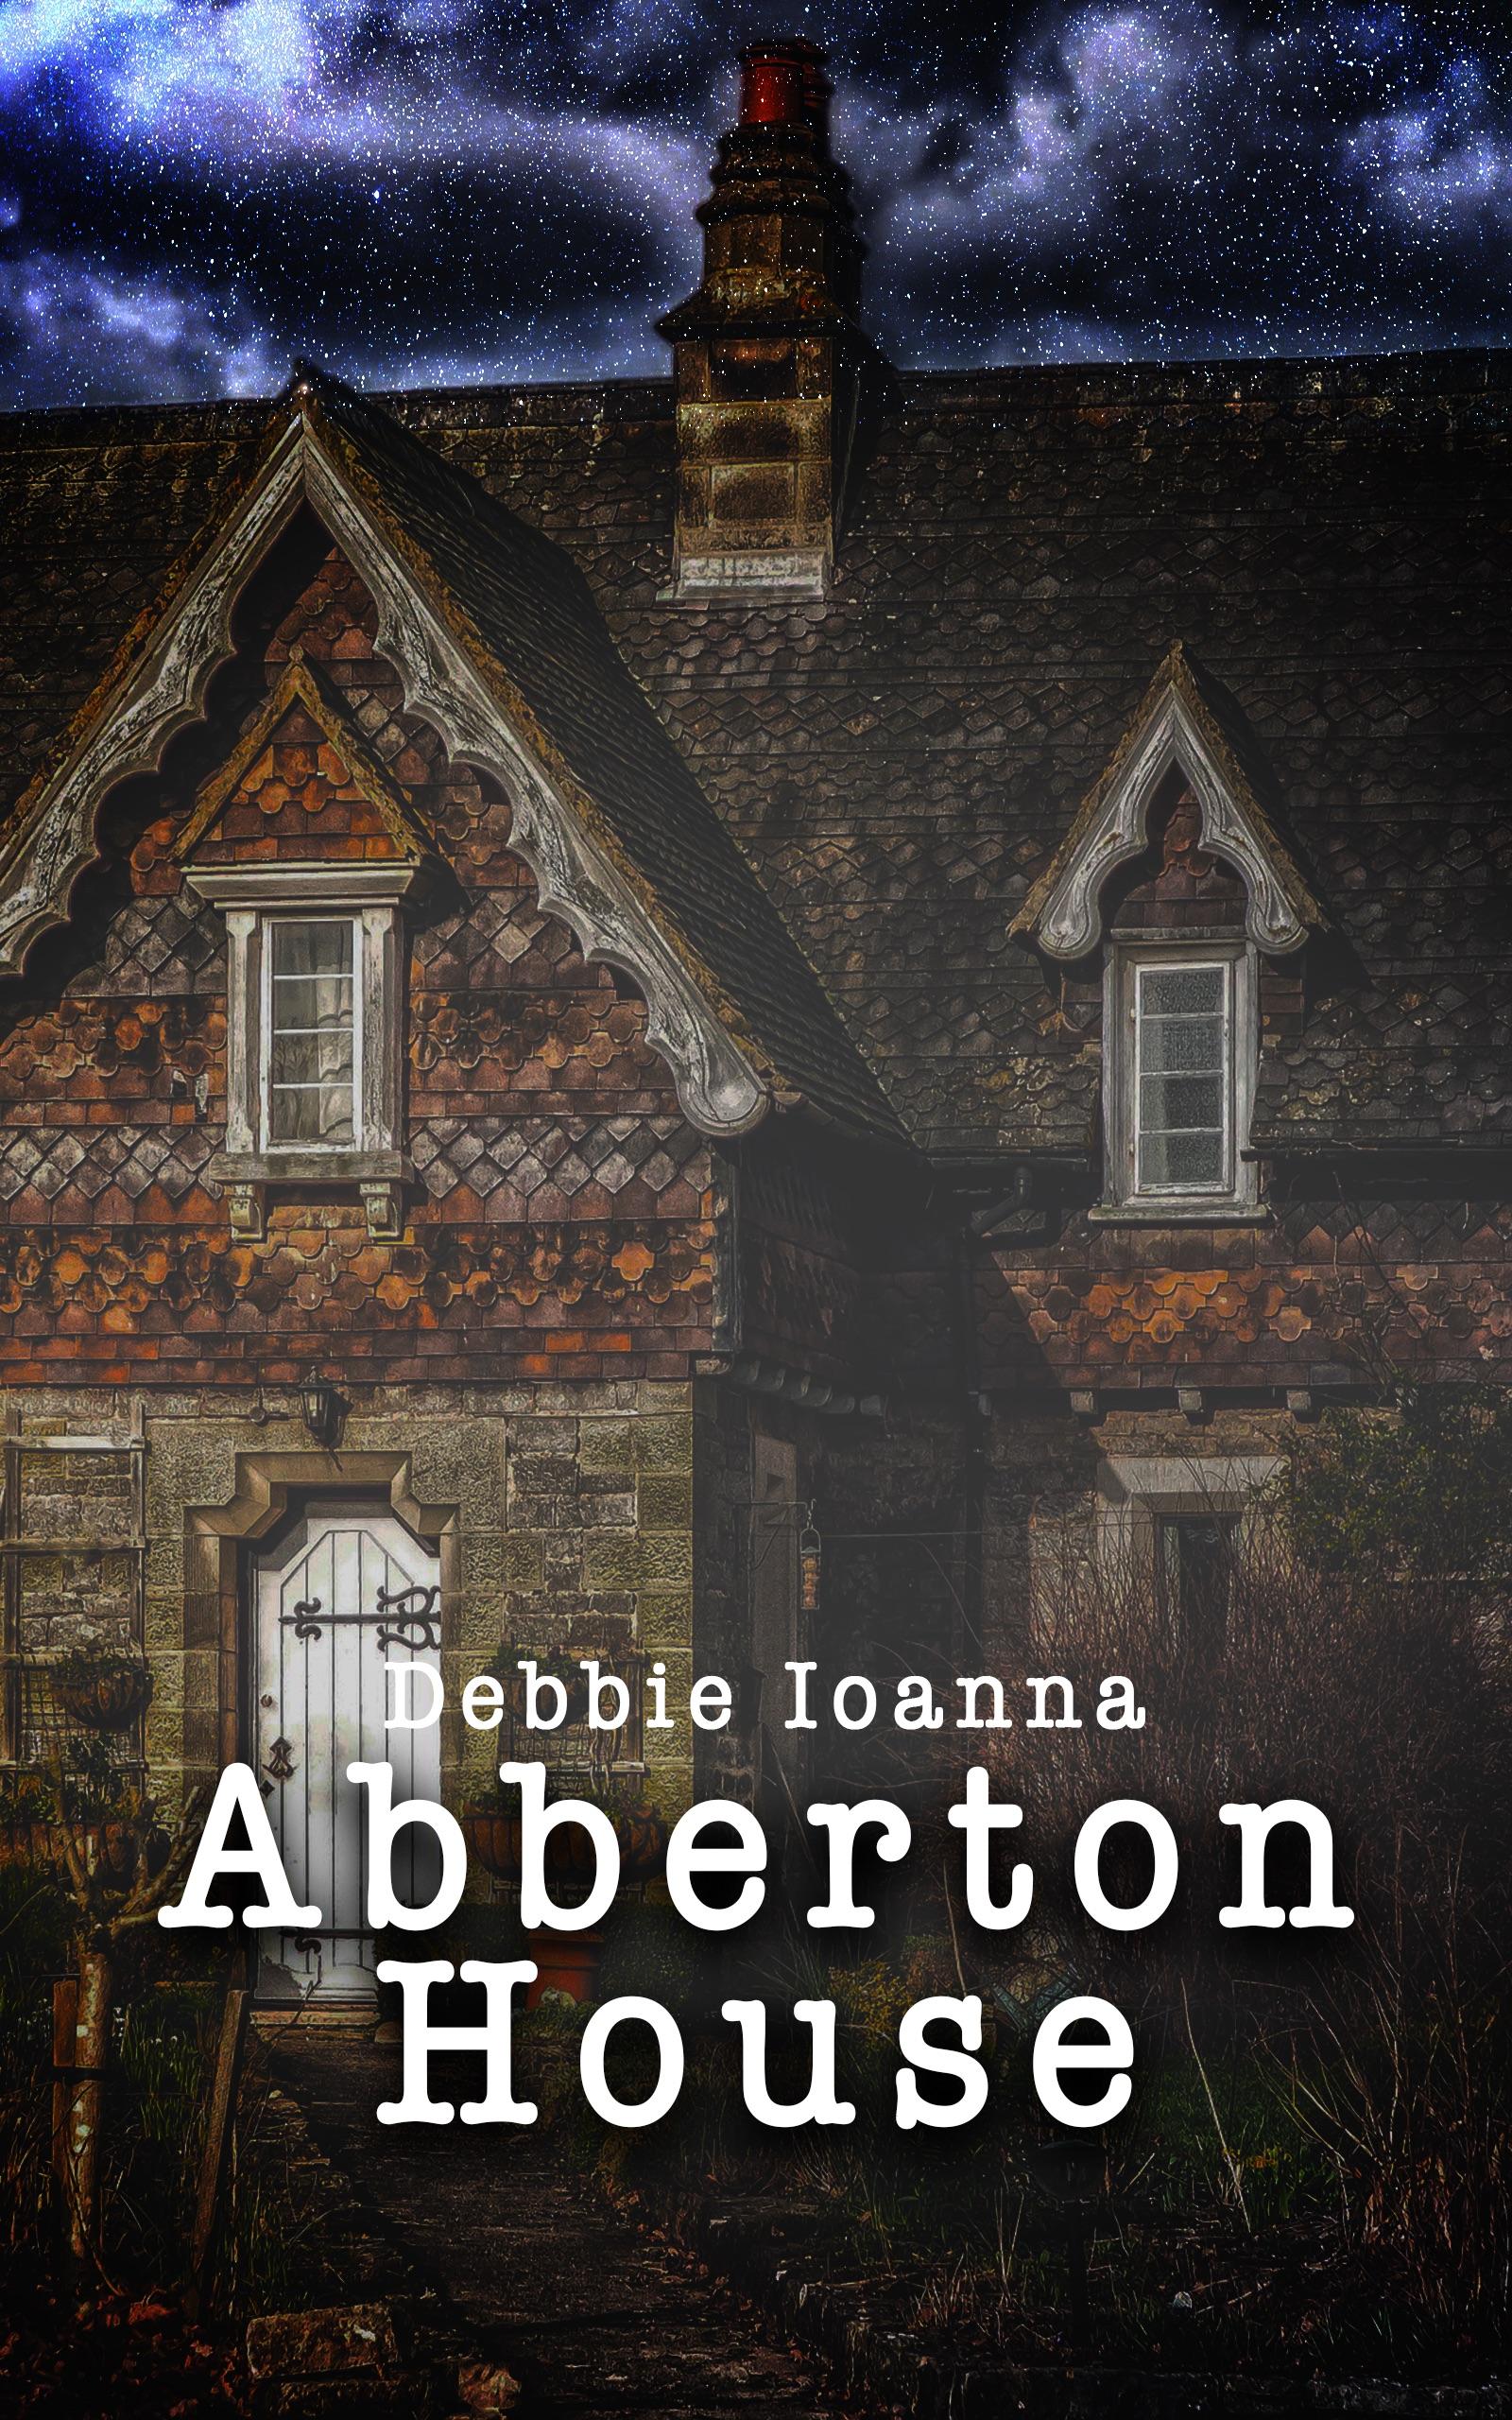 Abberton House by Debbie Ioanna @Debbie_Cleo @PantherPubs @damppebbles #BookReview #BlogTour